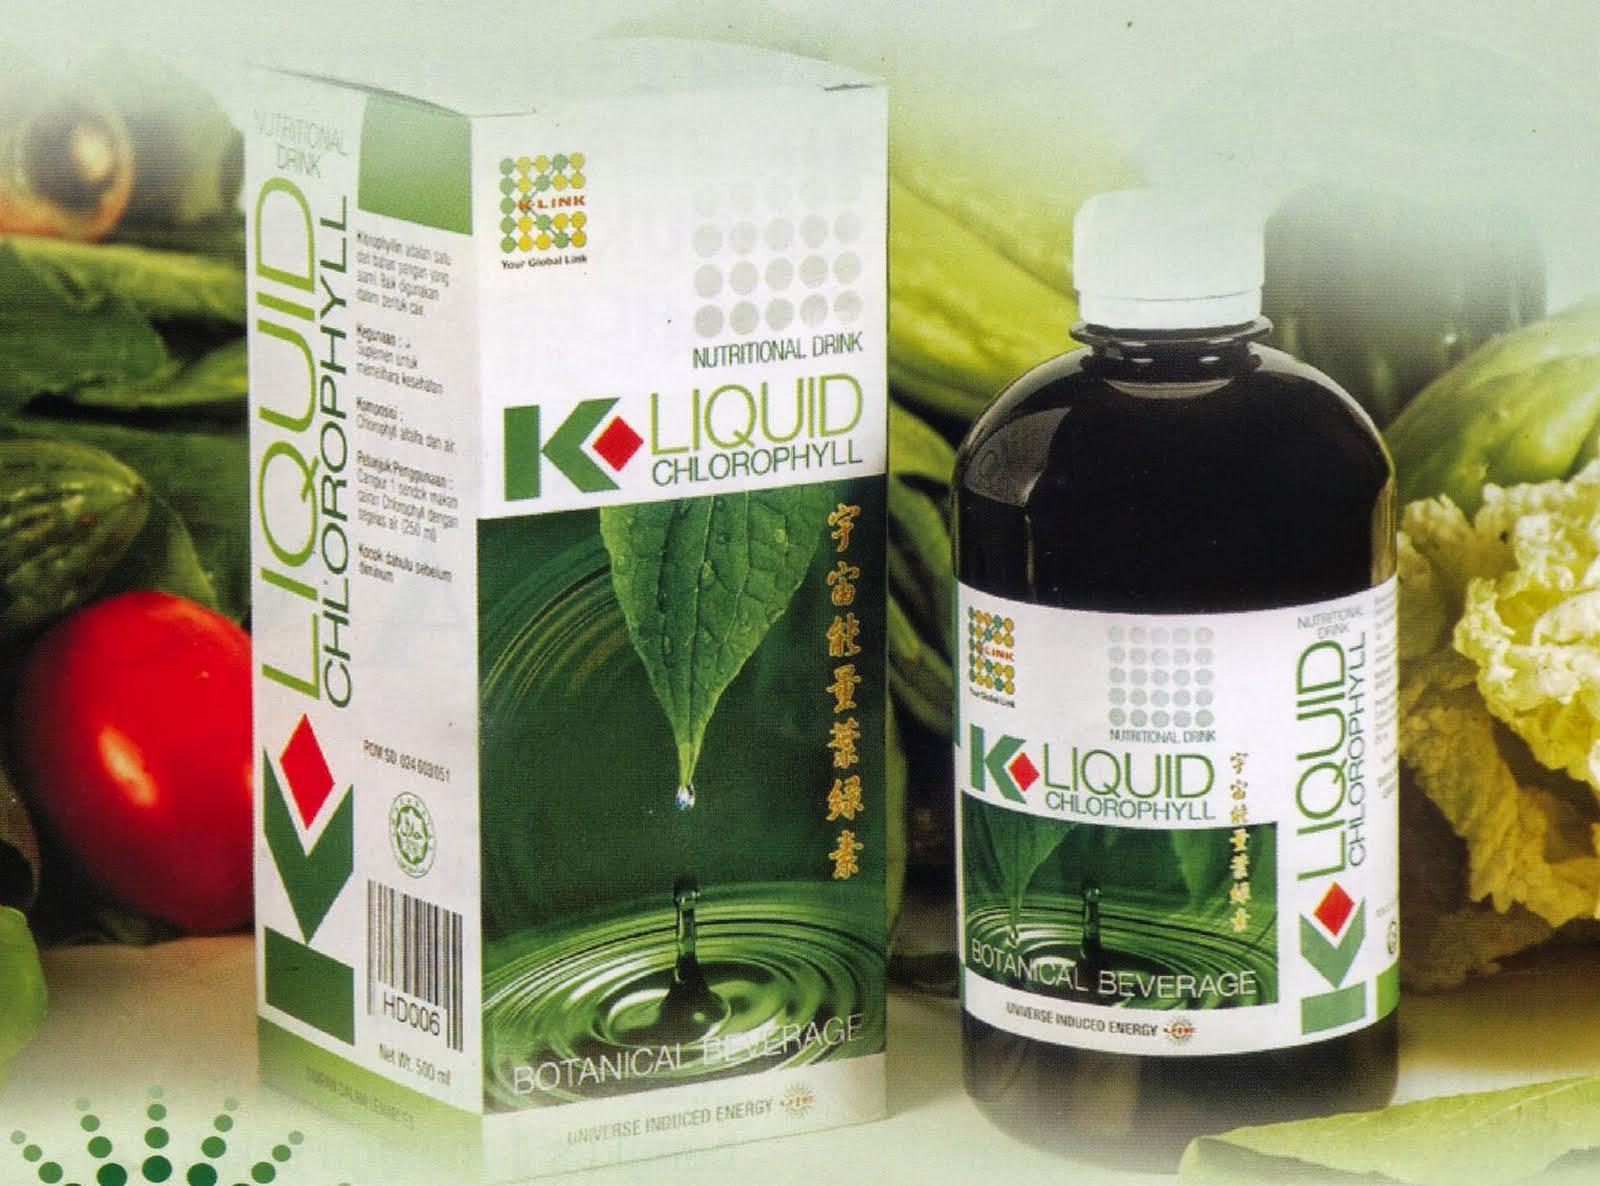 K-Liquid Chlorophyll / Klorofil K-Link murah